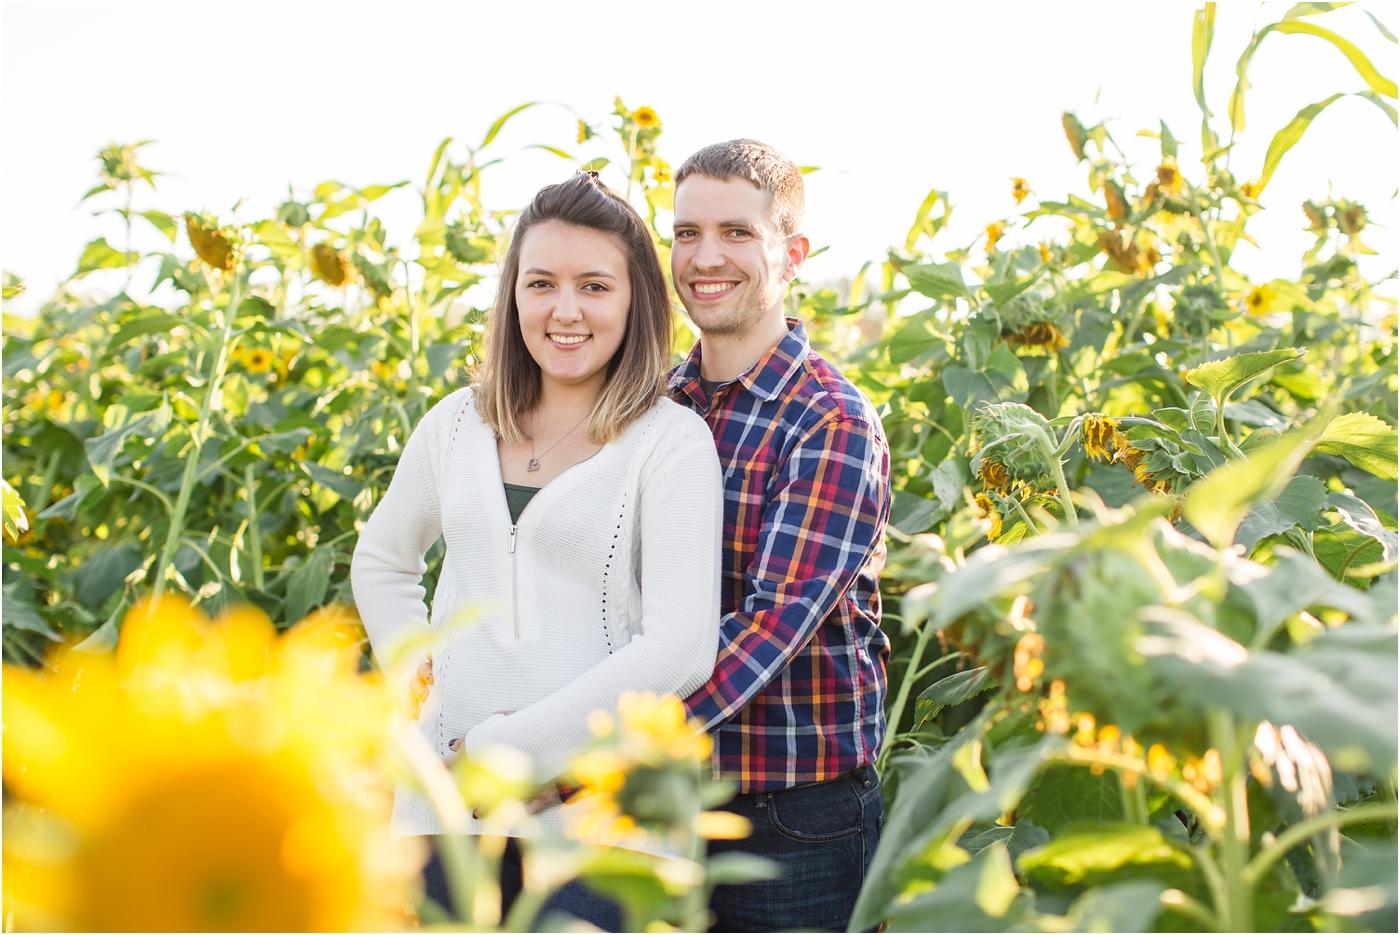 Larriland-Farm-Engagement-Photo_0003.jpg